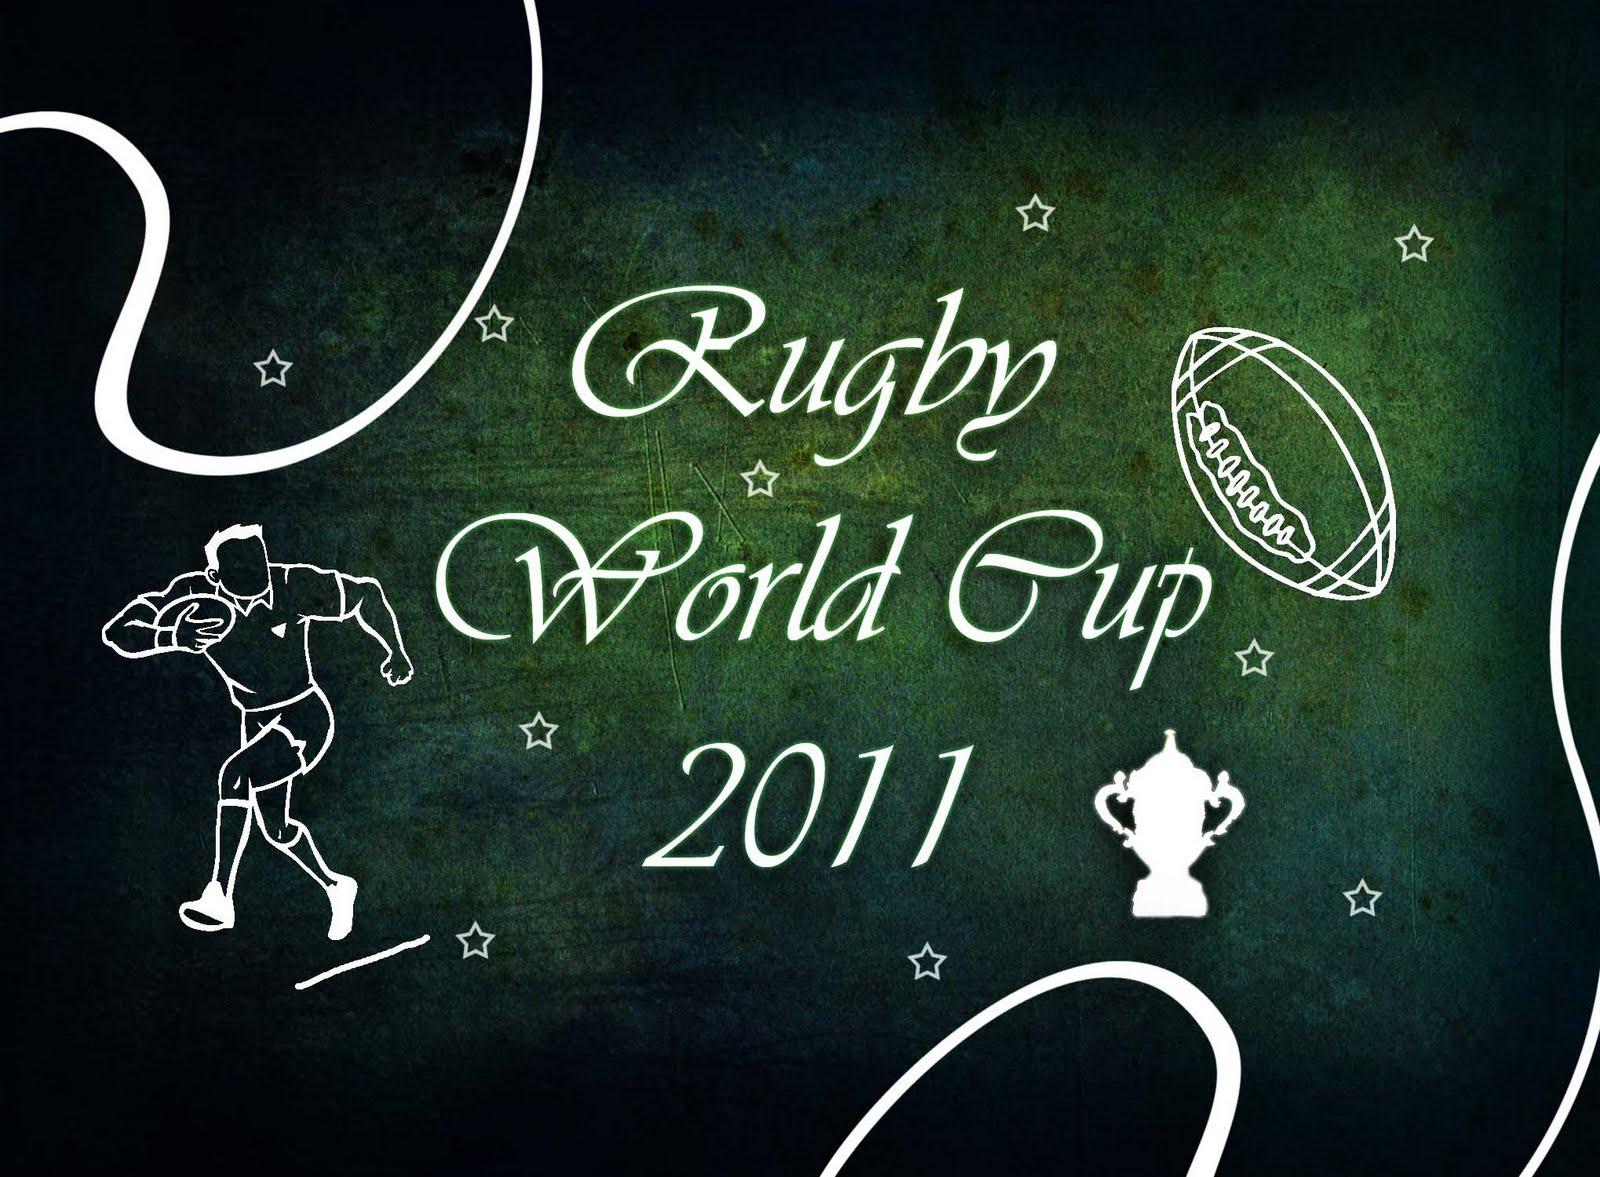 http://4.bp.blogspot.com/-zMbNTo9Zkf4/Te4MOzxlOlI/AAAAAAAAAKM/fz6R8X2U1vc/s1600/rugby_world_cup_2011.jpg